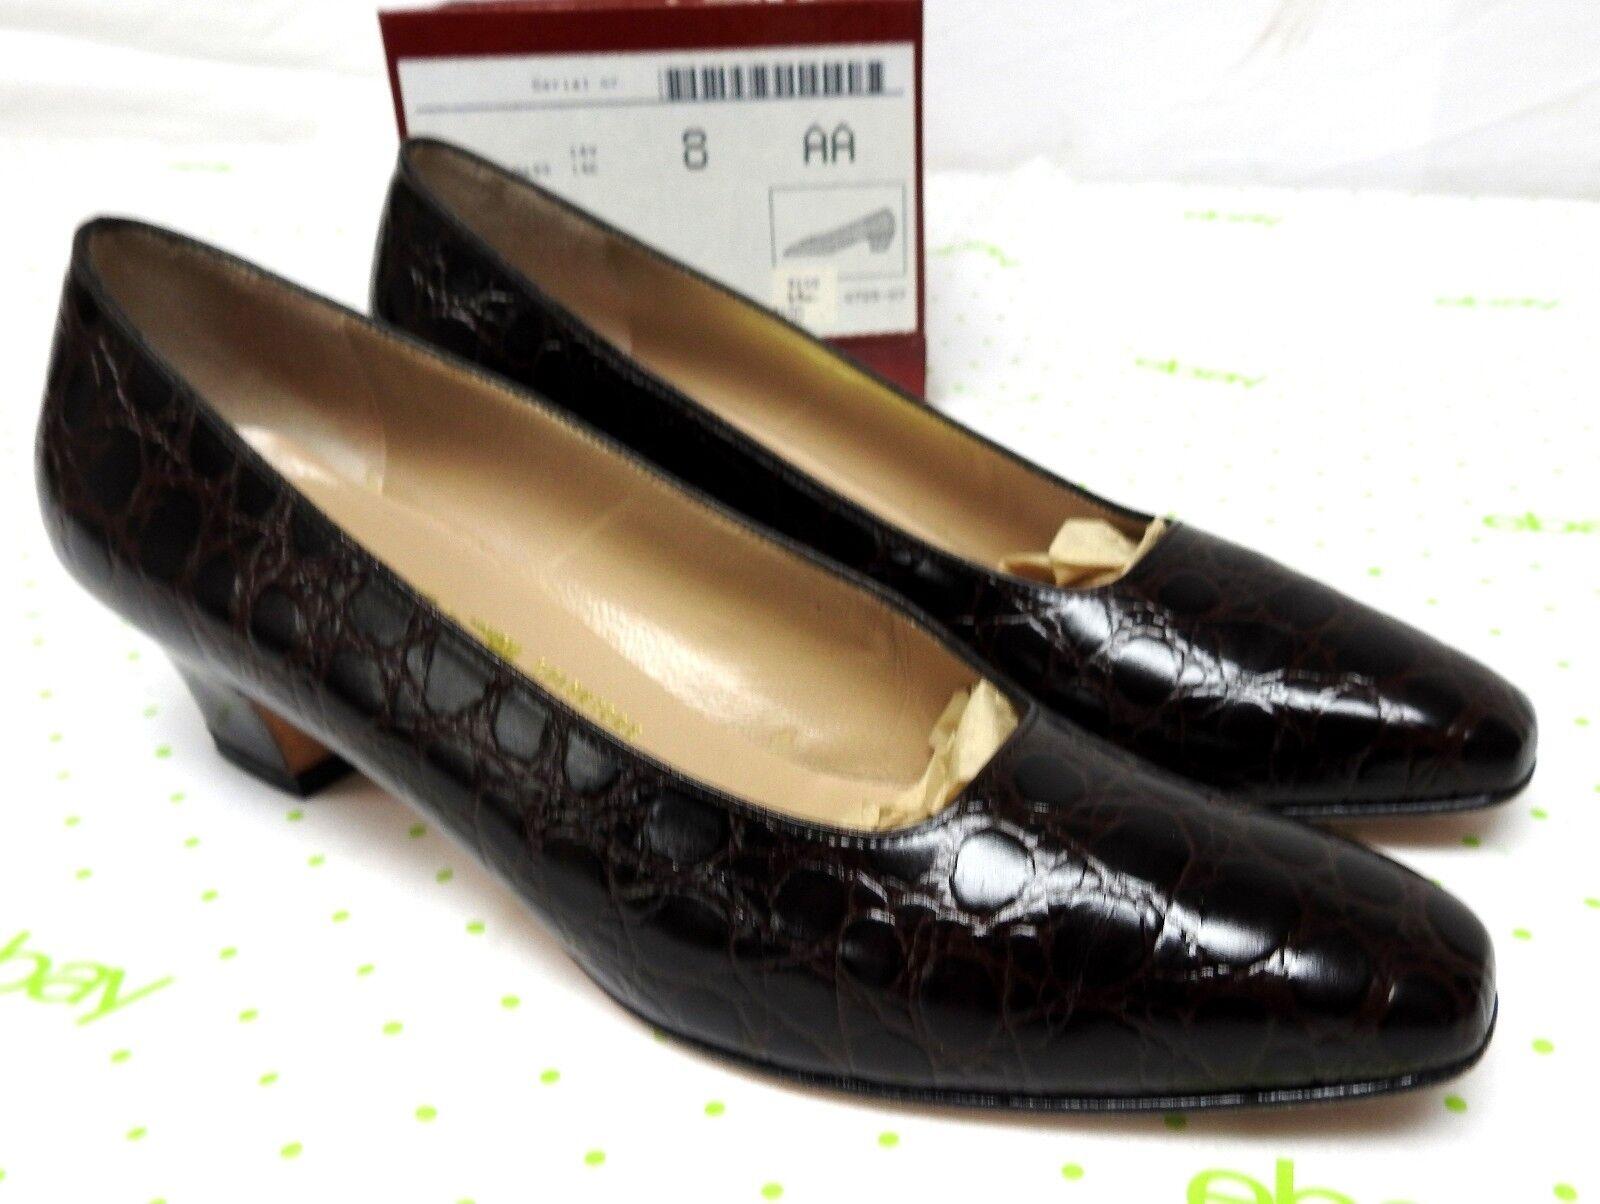 Salvatore Ferragamo Damens's Größe 8 AA Narrow pumps Leder Braun calf croc